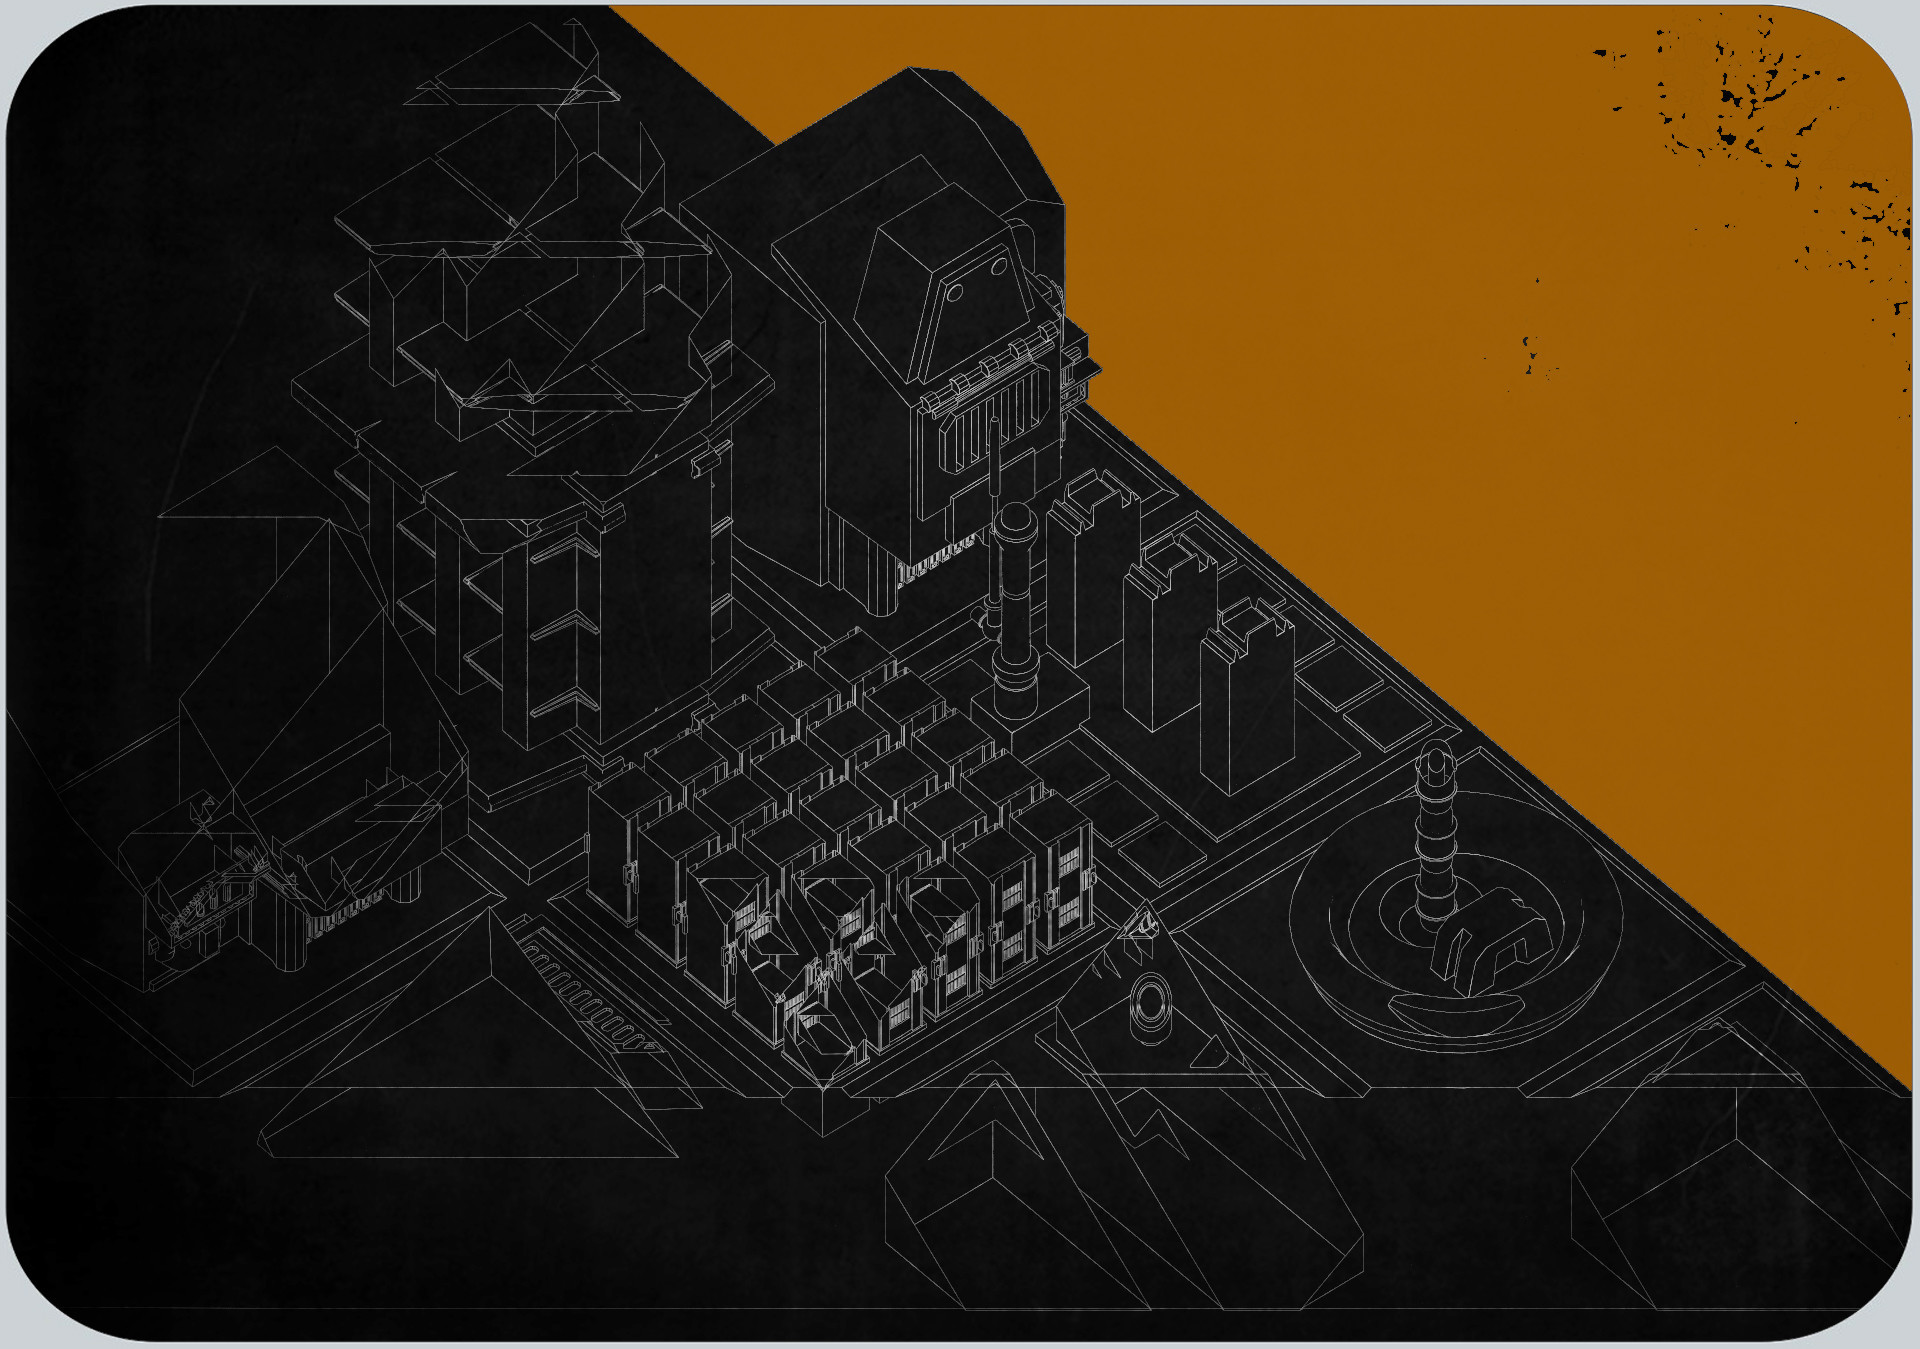 Ben nicholas ben nicholas sovietblueprint abstraction 03